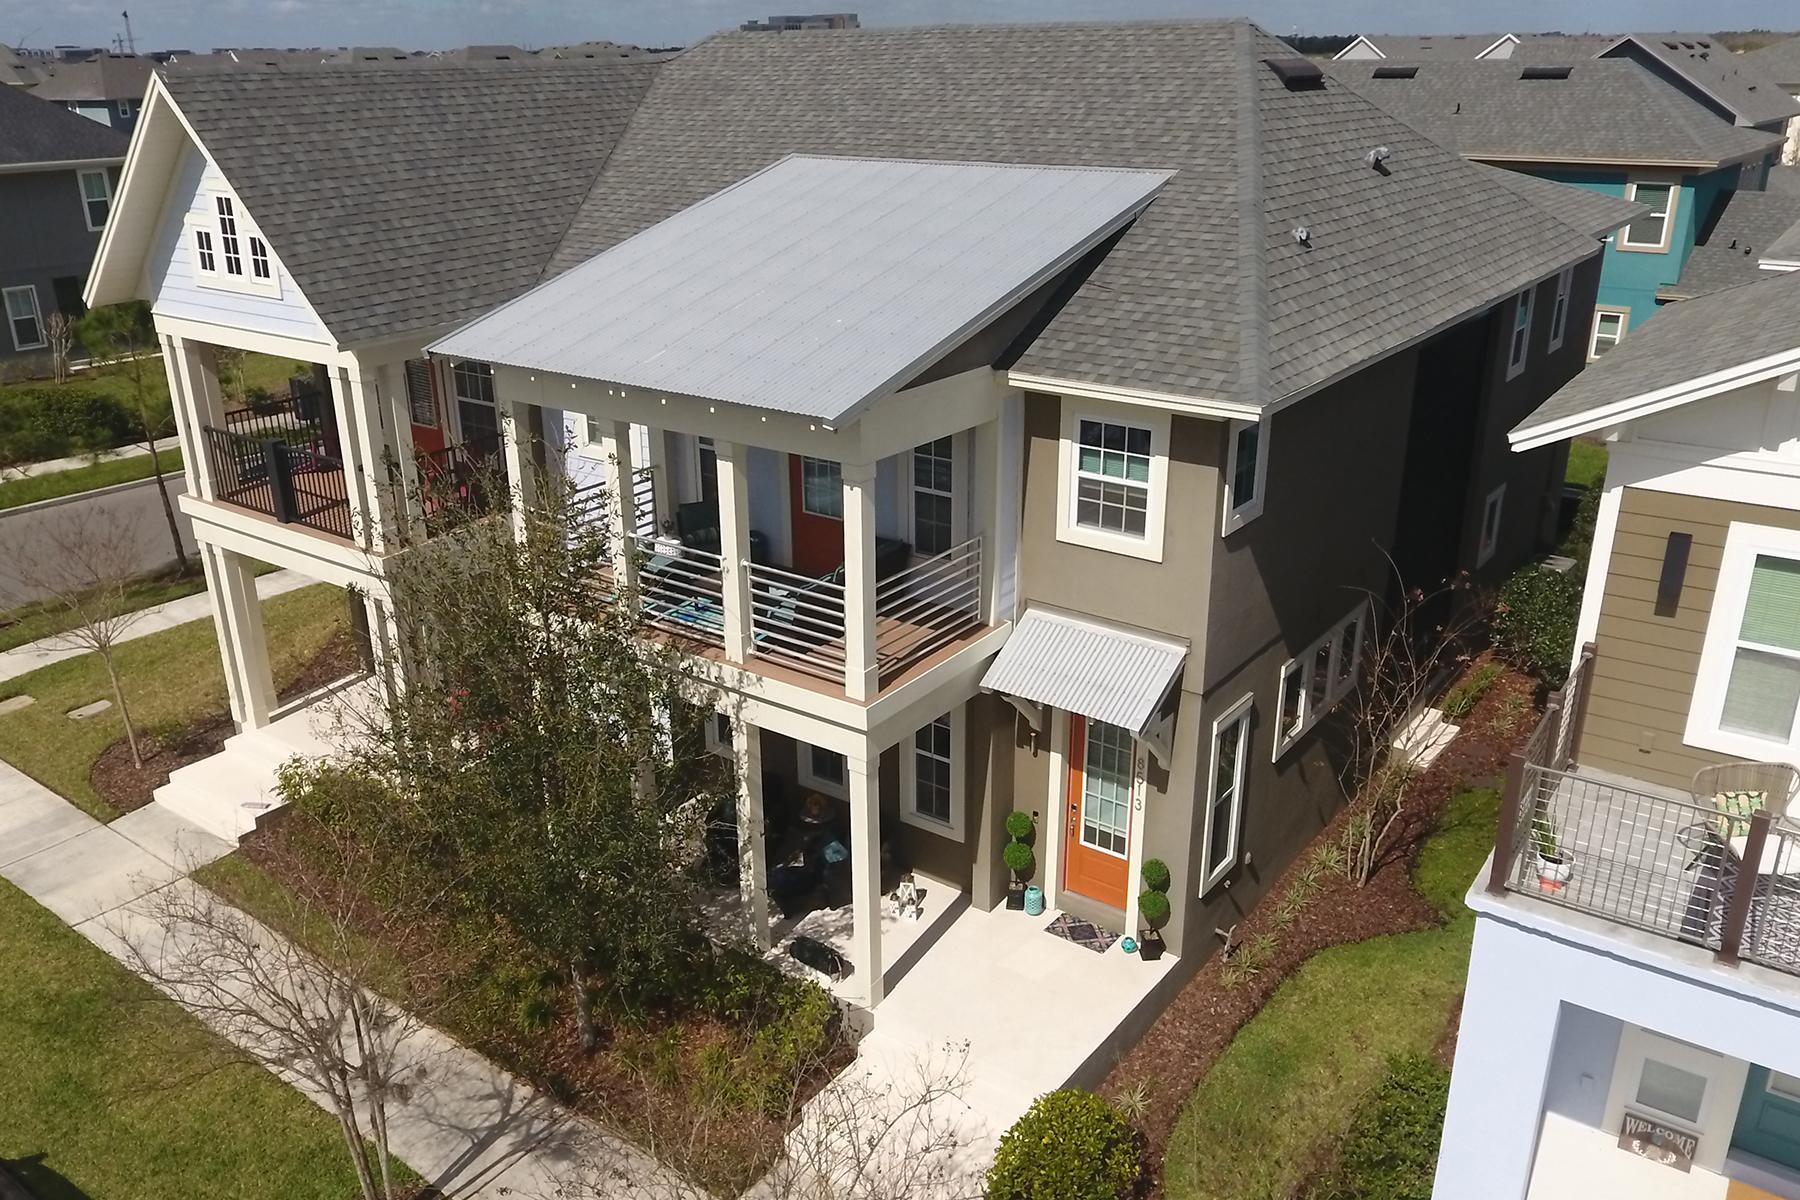 Townhouse for Sale at 8513 Pinter St , Orlando, FL 32827 8513 Pinter St, Orlando, Florida, 32827 United States